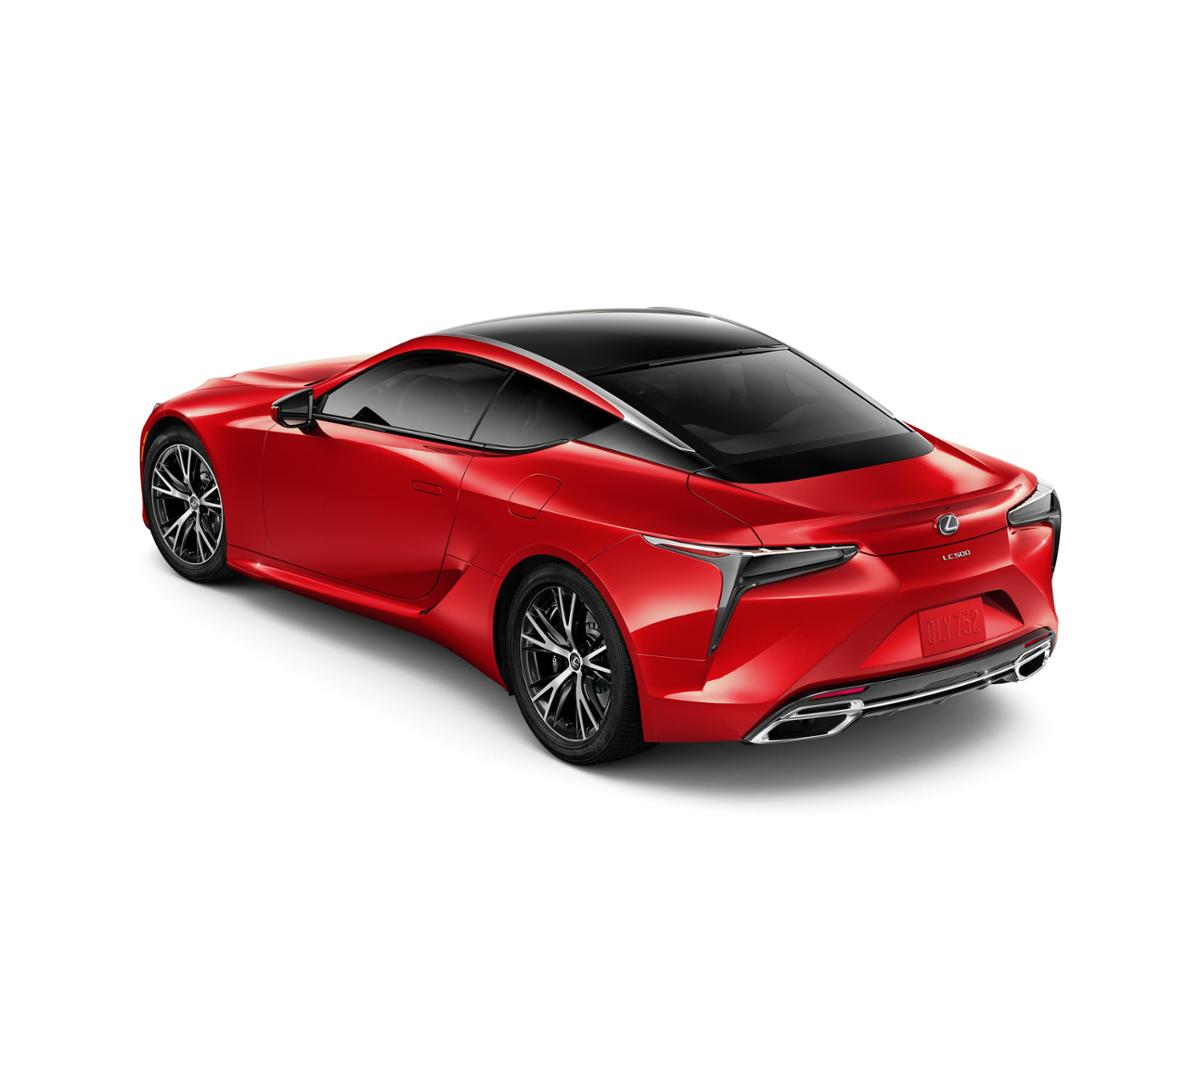 New 2019 Lexus LC 500 For Sale In Escondido, CA